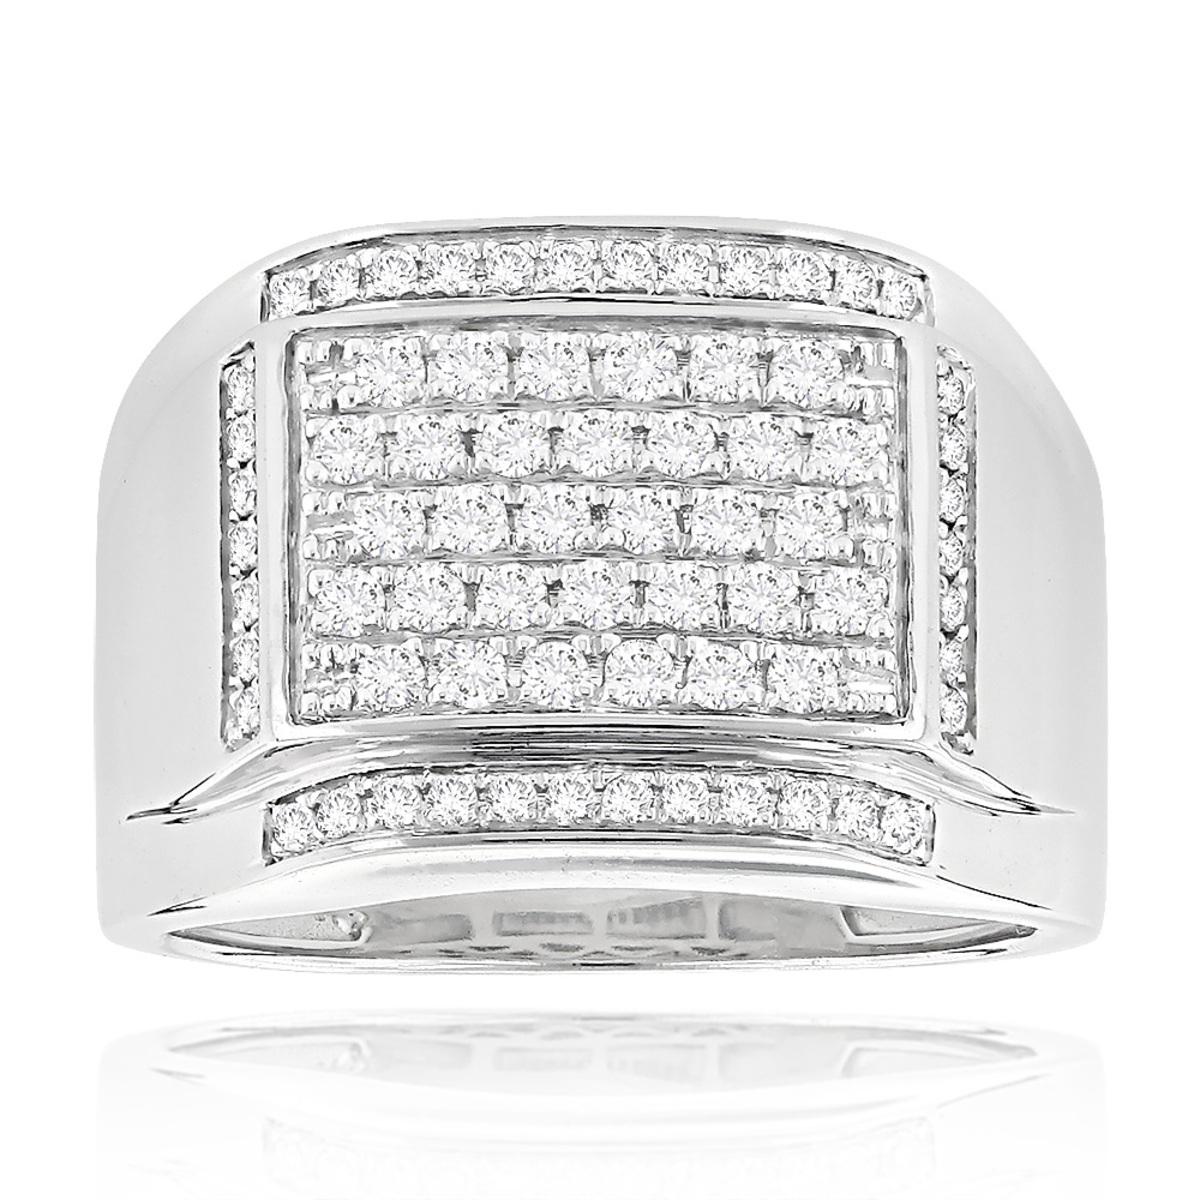 Mens Diamond Band 14K Gold Wedding Ring 1ct by Luxurman